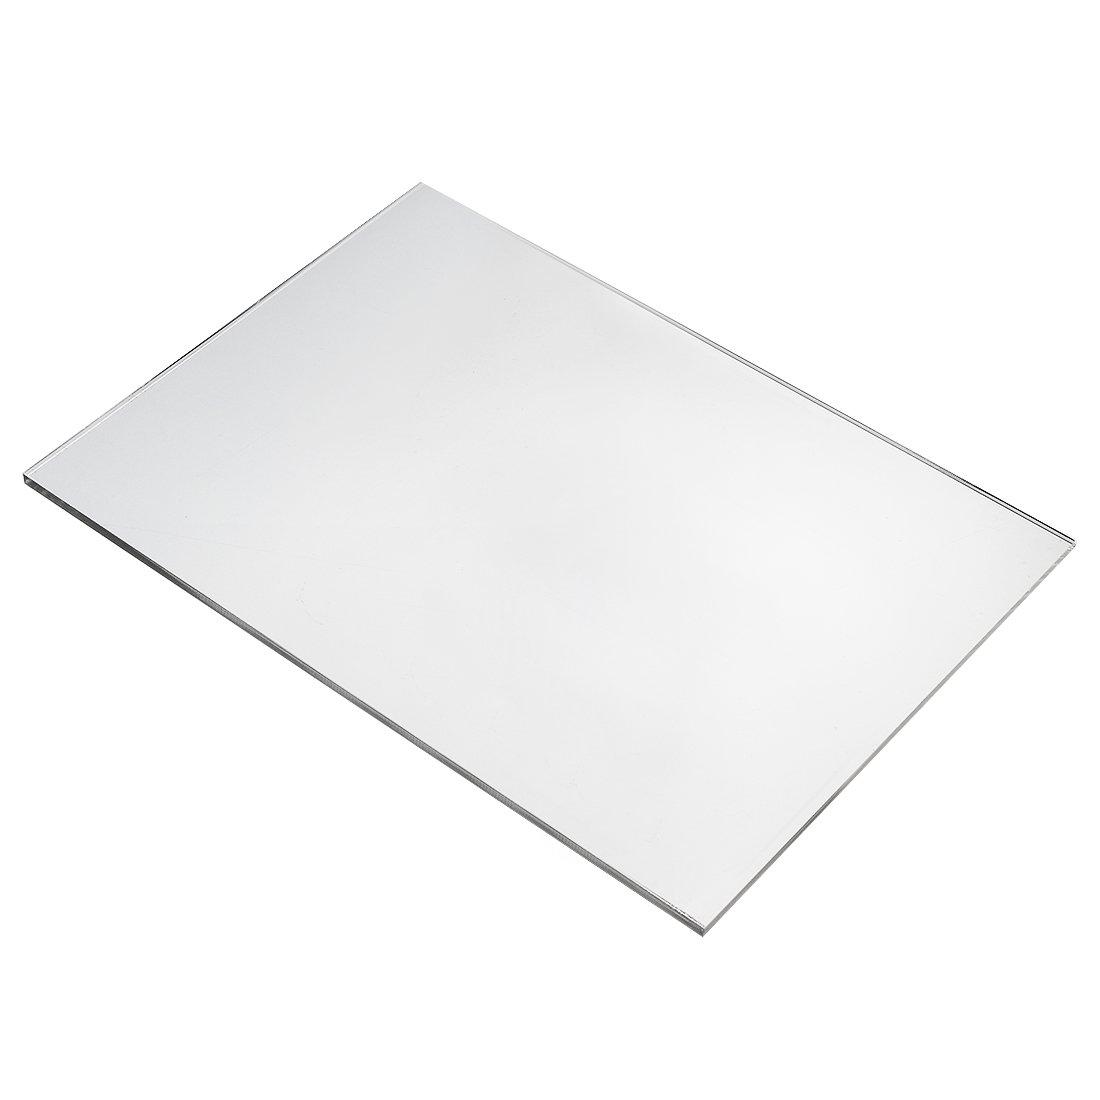 sourcingmap/® 1mm Clear Plastic Acrylic Plexiglass Sheet A5 Size 148mmx210mm